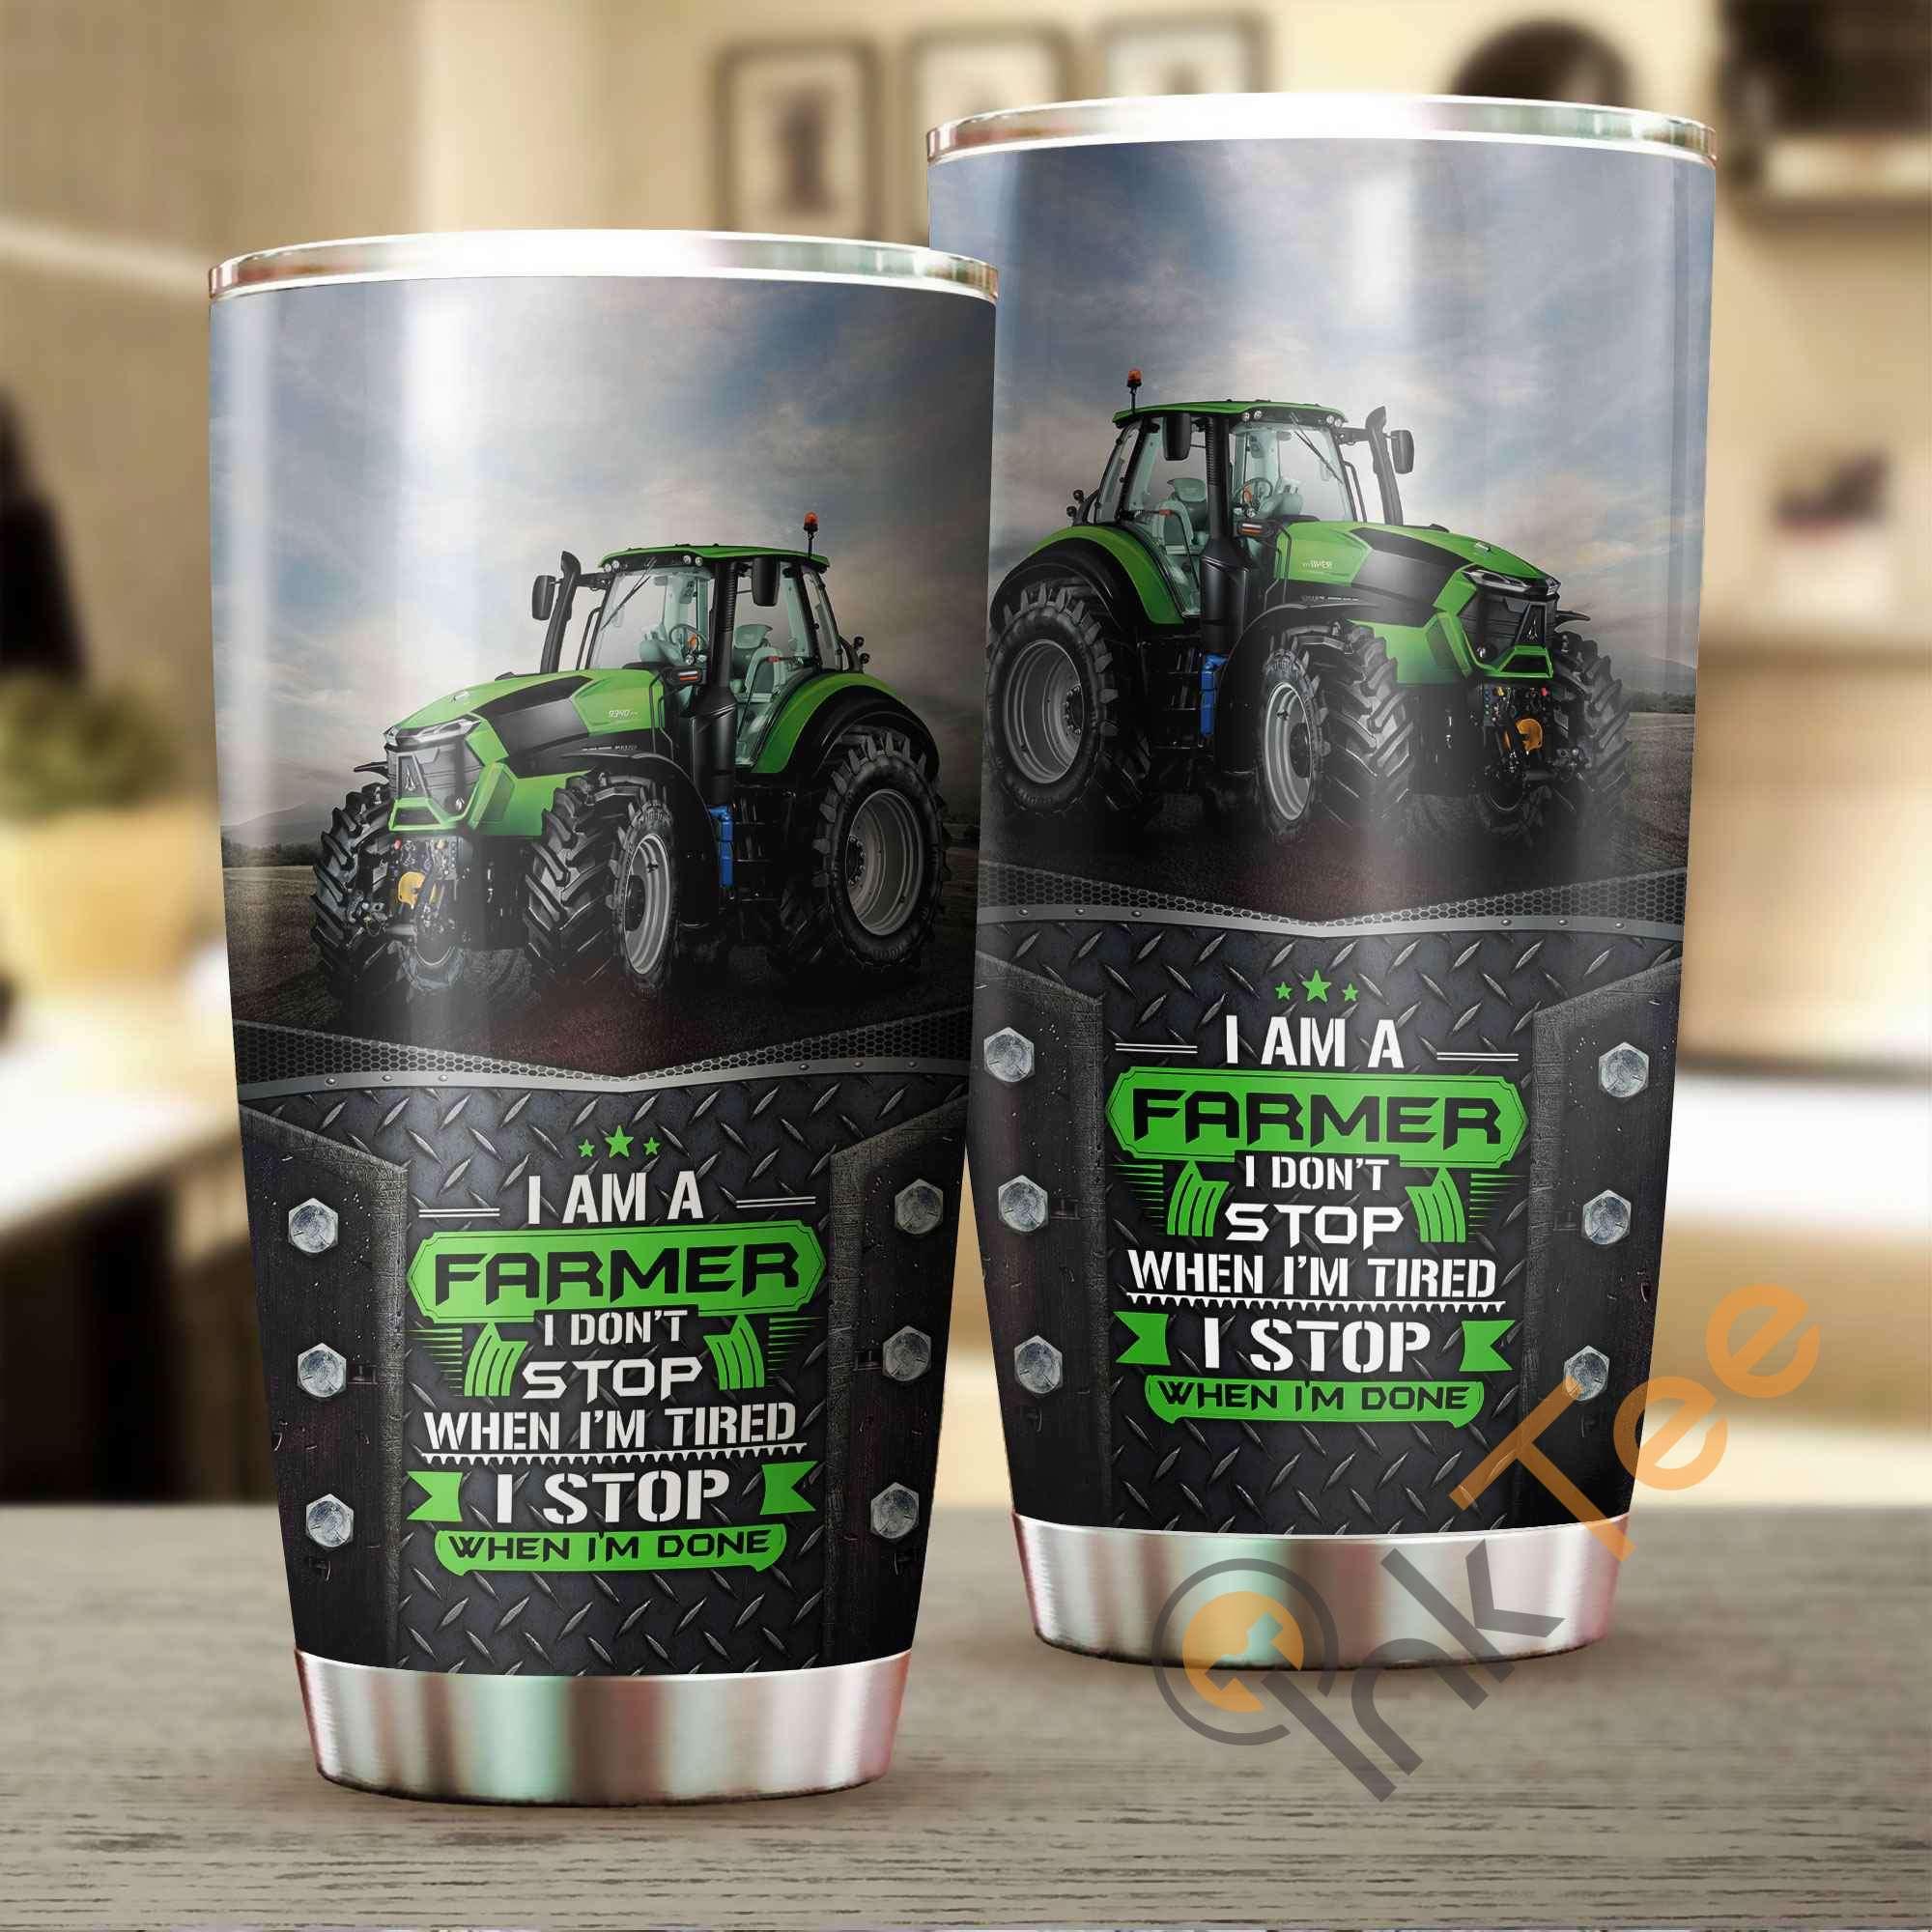 I Am A Farmer Amazon Best Seller Sku 2516 Stainless Steel Tumbler